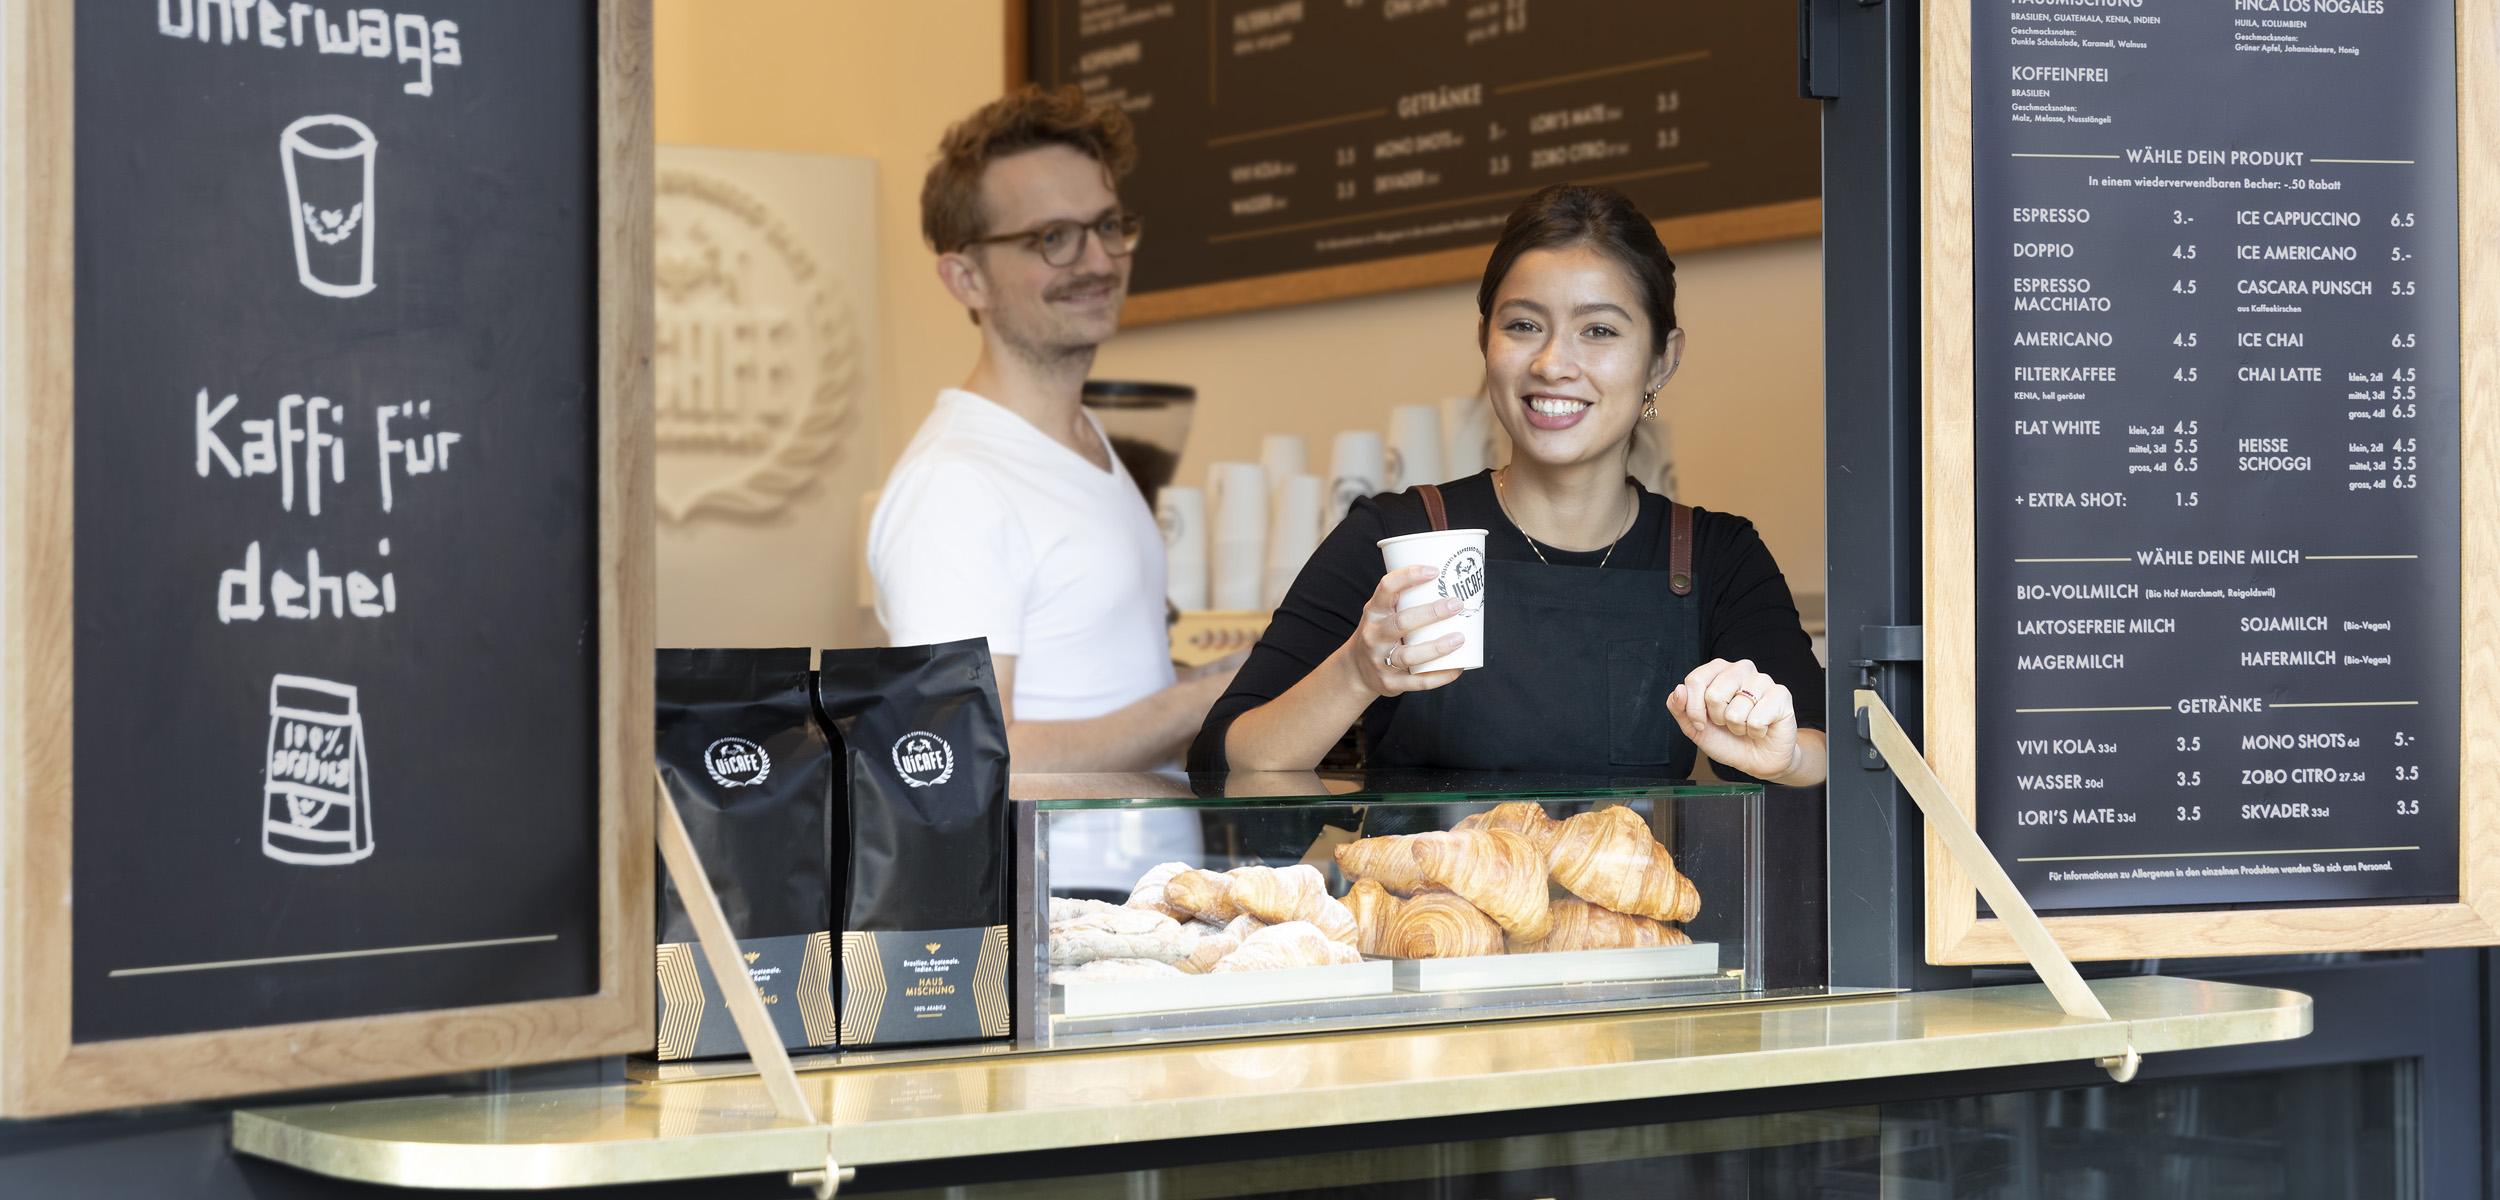 ViCAFE | Kaffeerösterei | Espresso Bars | Kaffee-Abo & Online-Shop